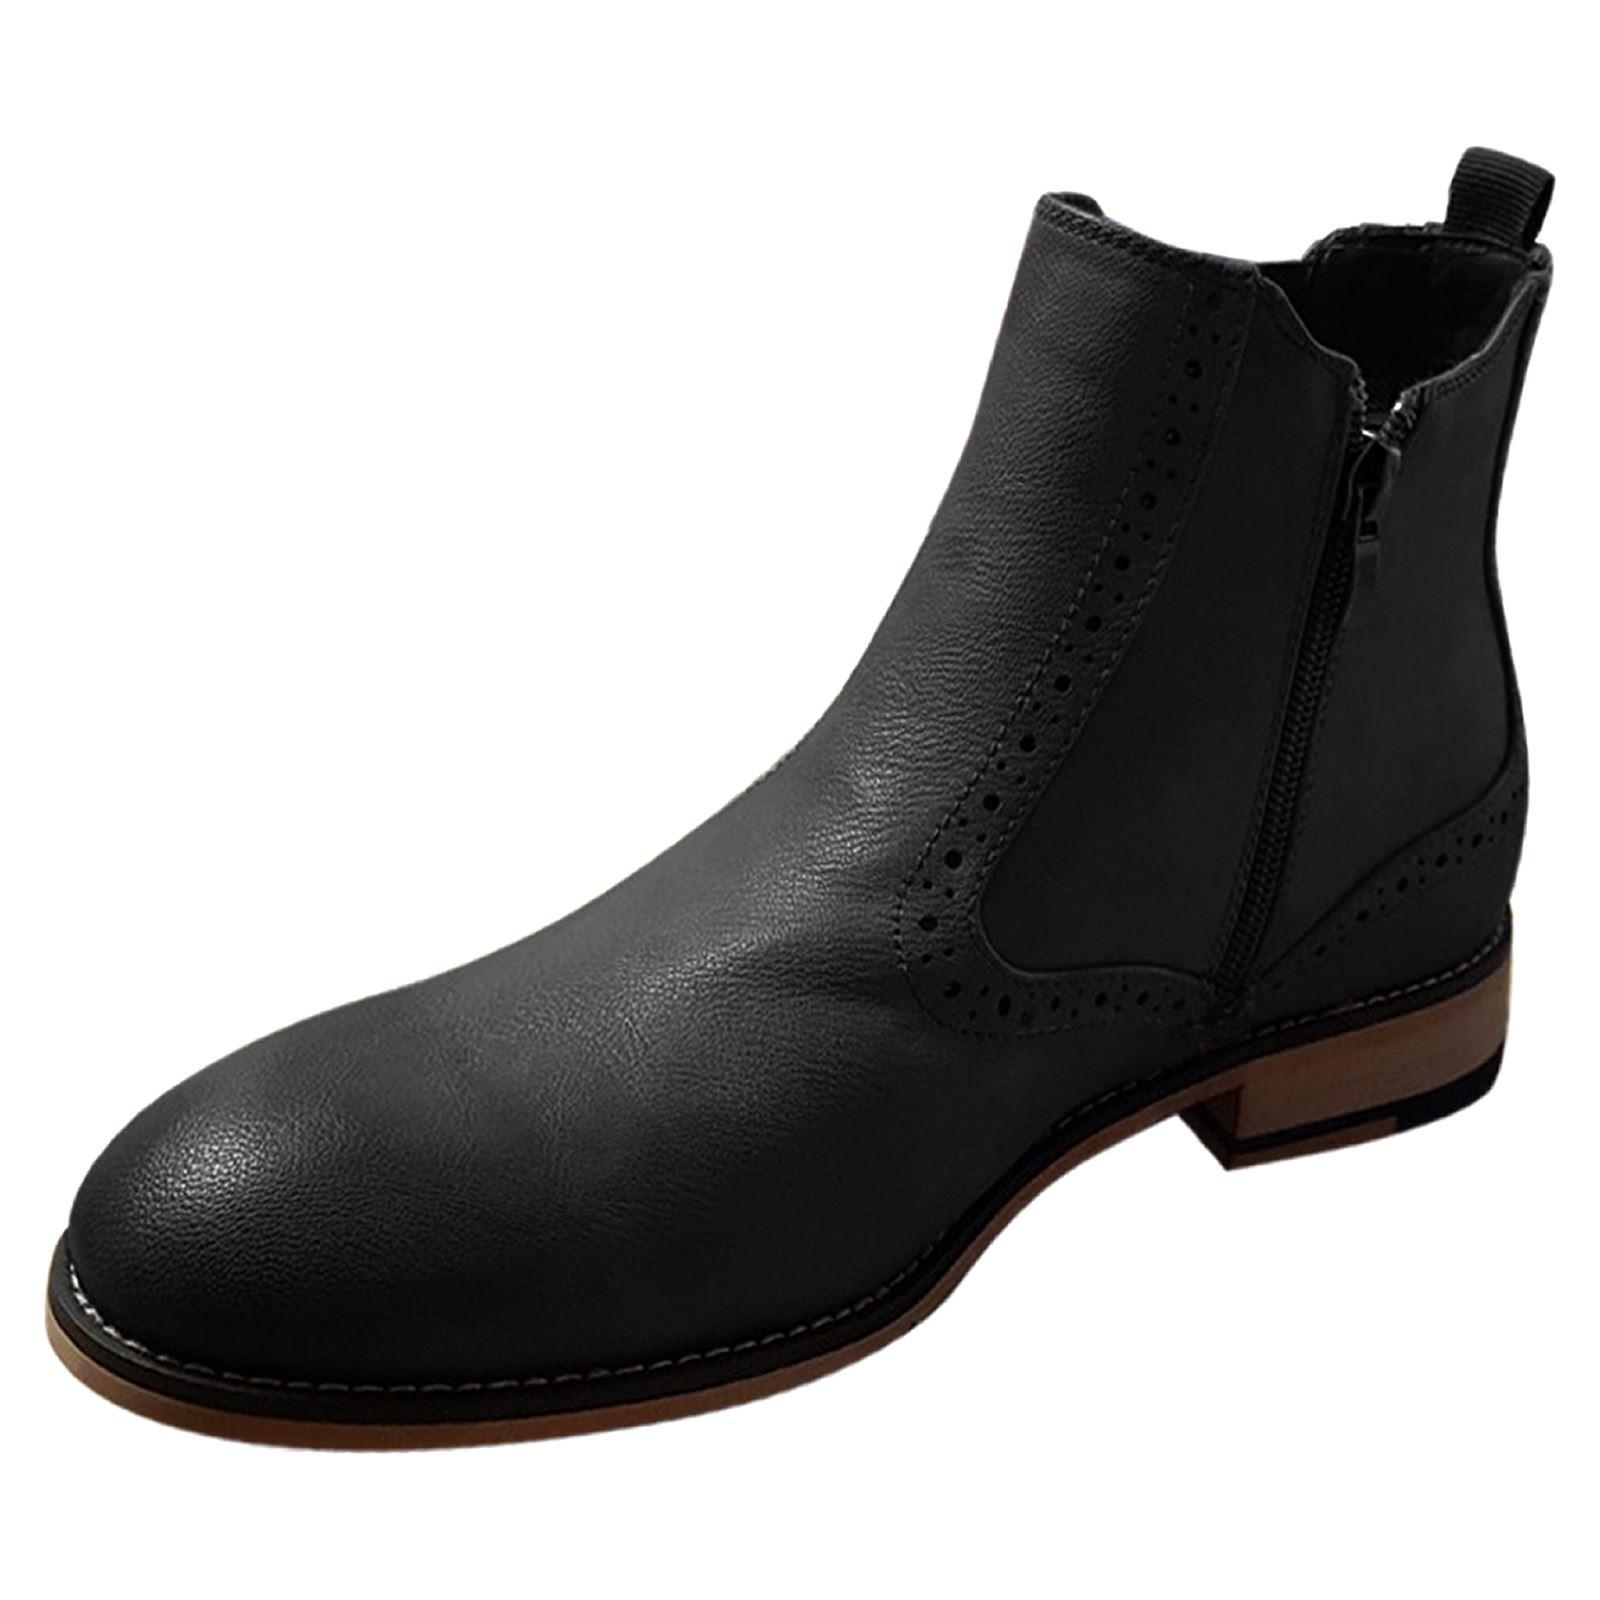 miniature 3 - Homme-Bottines-Chelsea-CAVANI-Fox-Aspect-Cuir-Slip-On-Classic-Mod-Chaussures